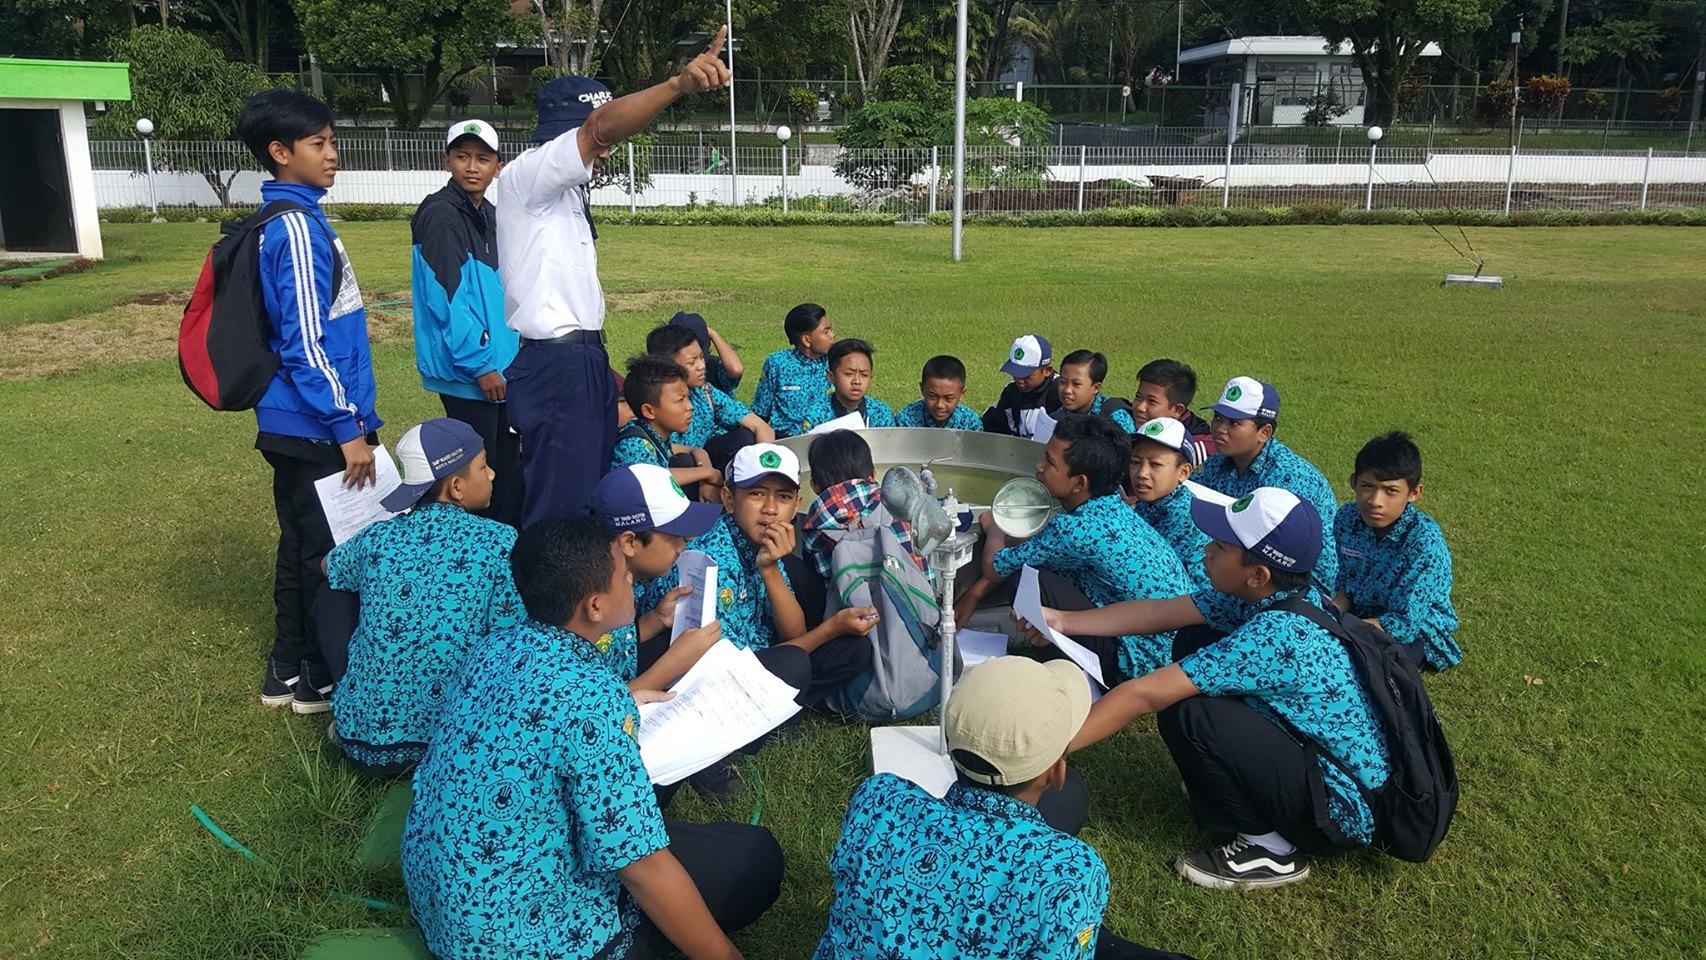 Rabu,22-02-2017 Kunjungan Siswa SMP Wahid Hasyim Kota Malang